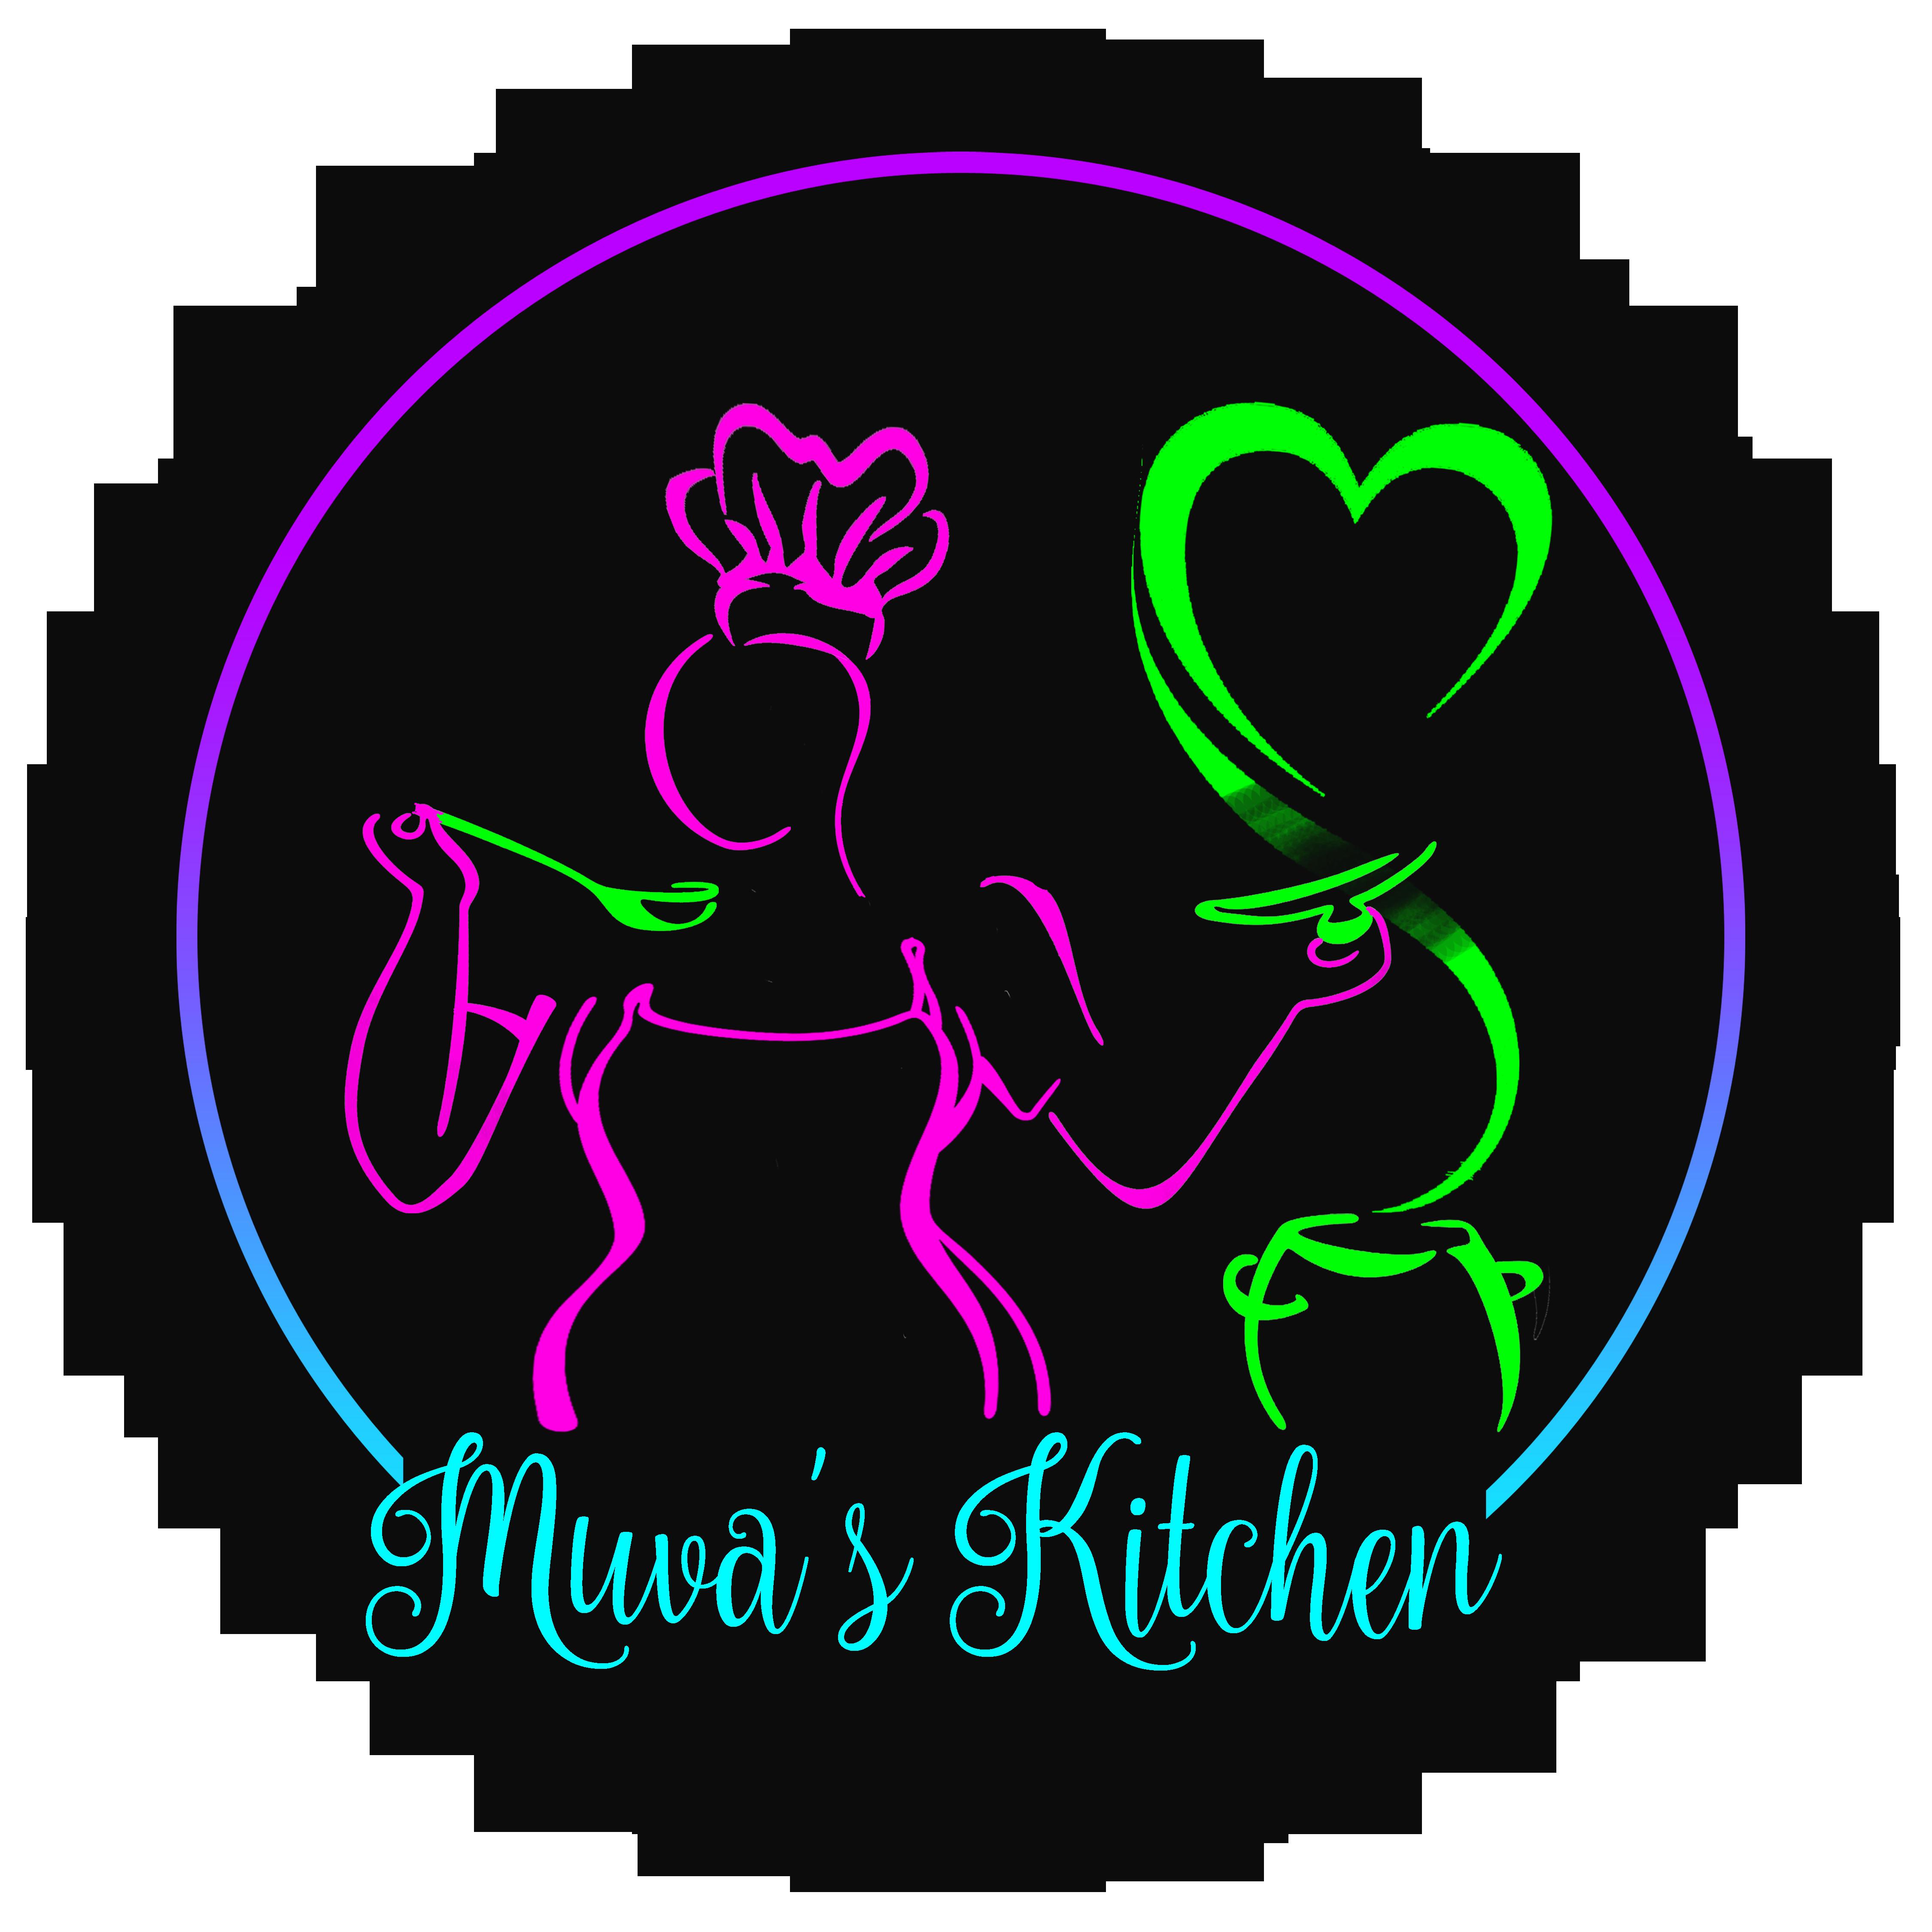 Muva's Kitchen